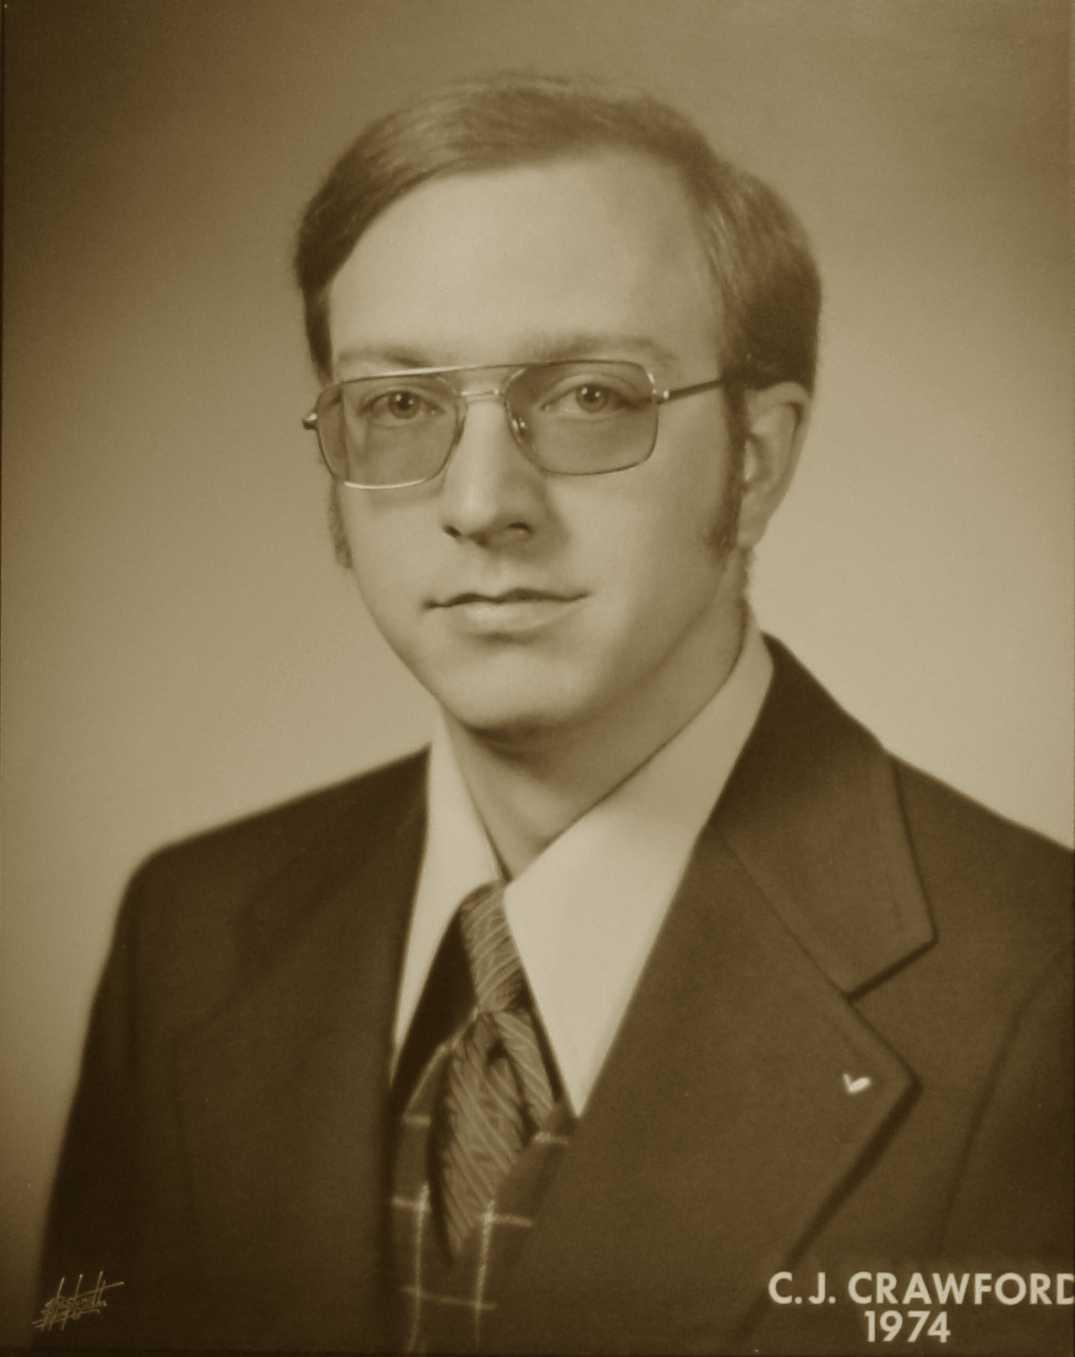 C. J. Crawford, 1974